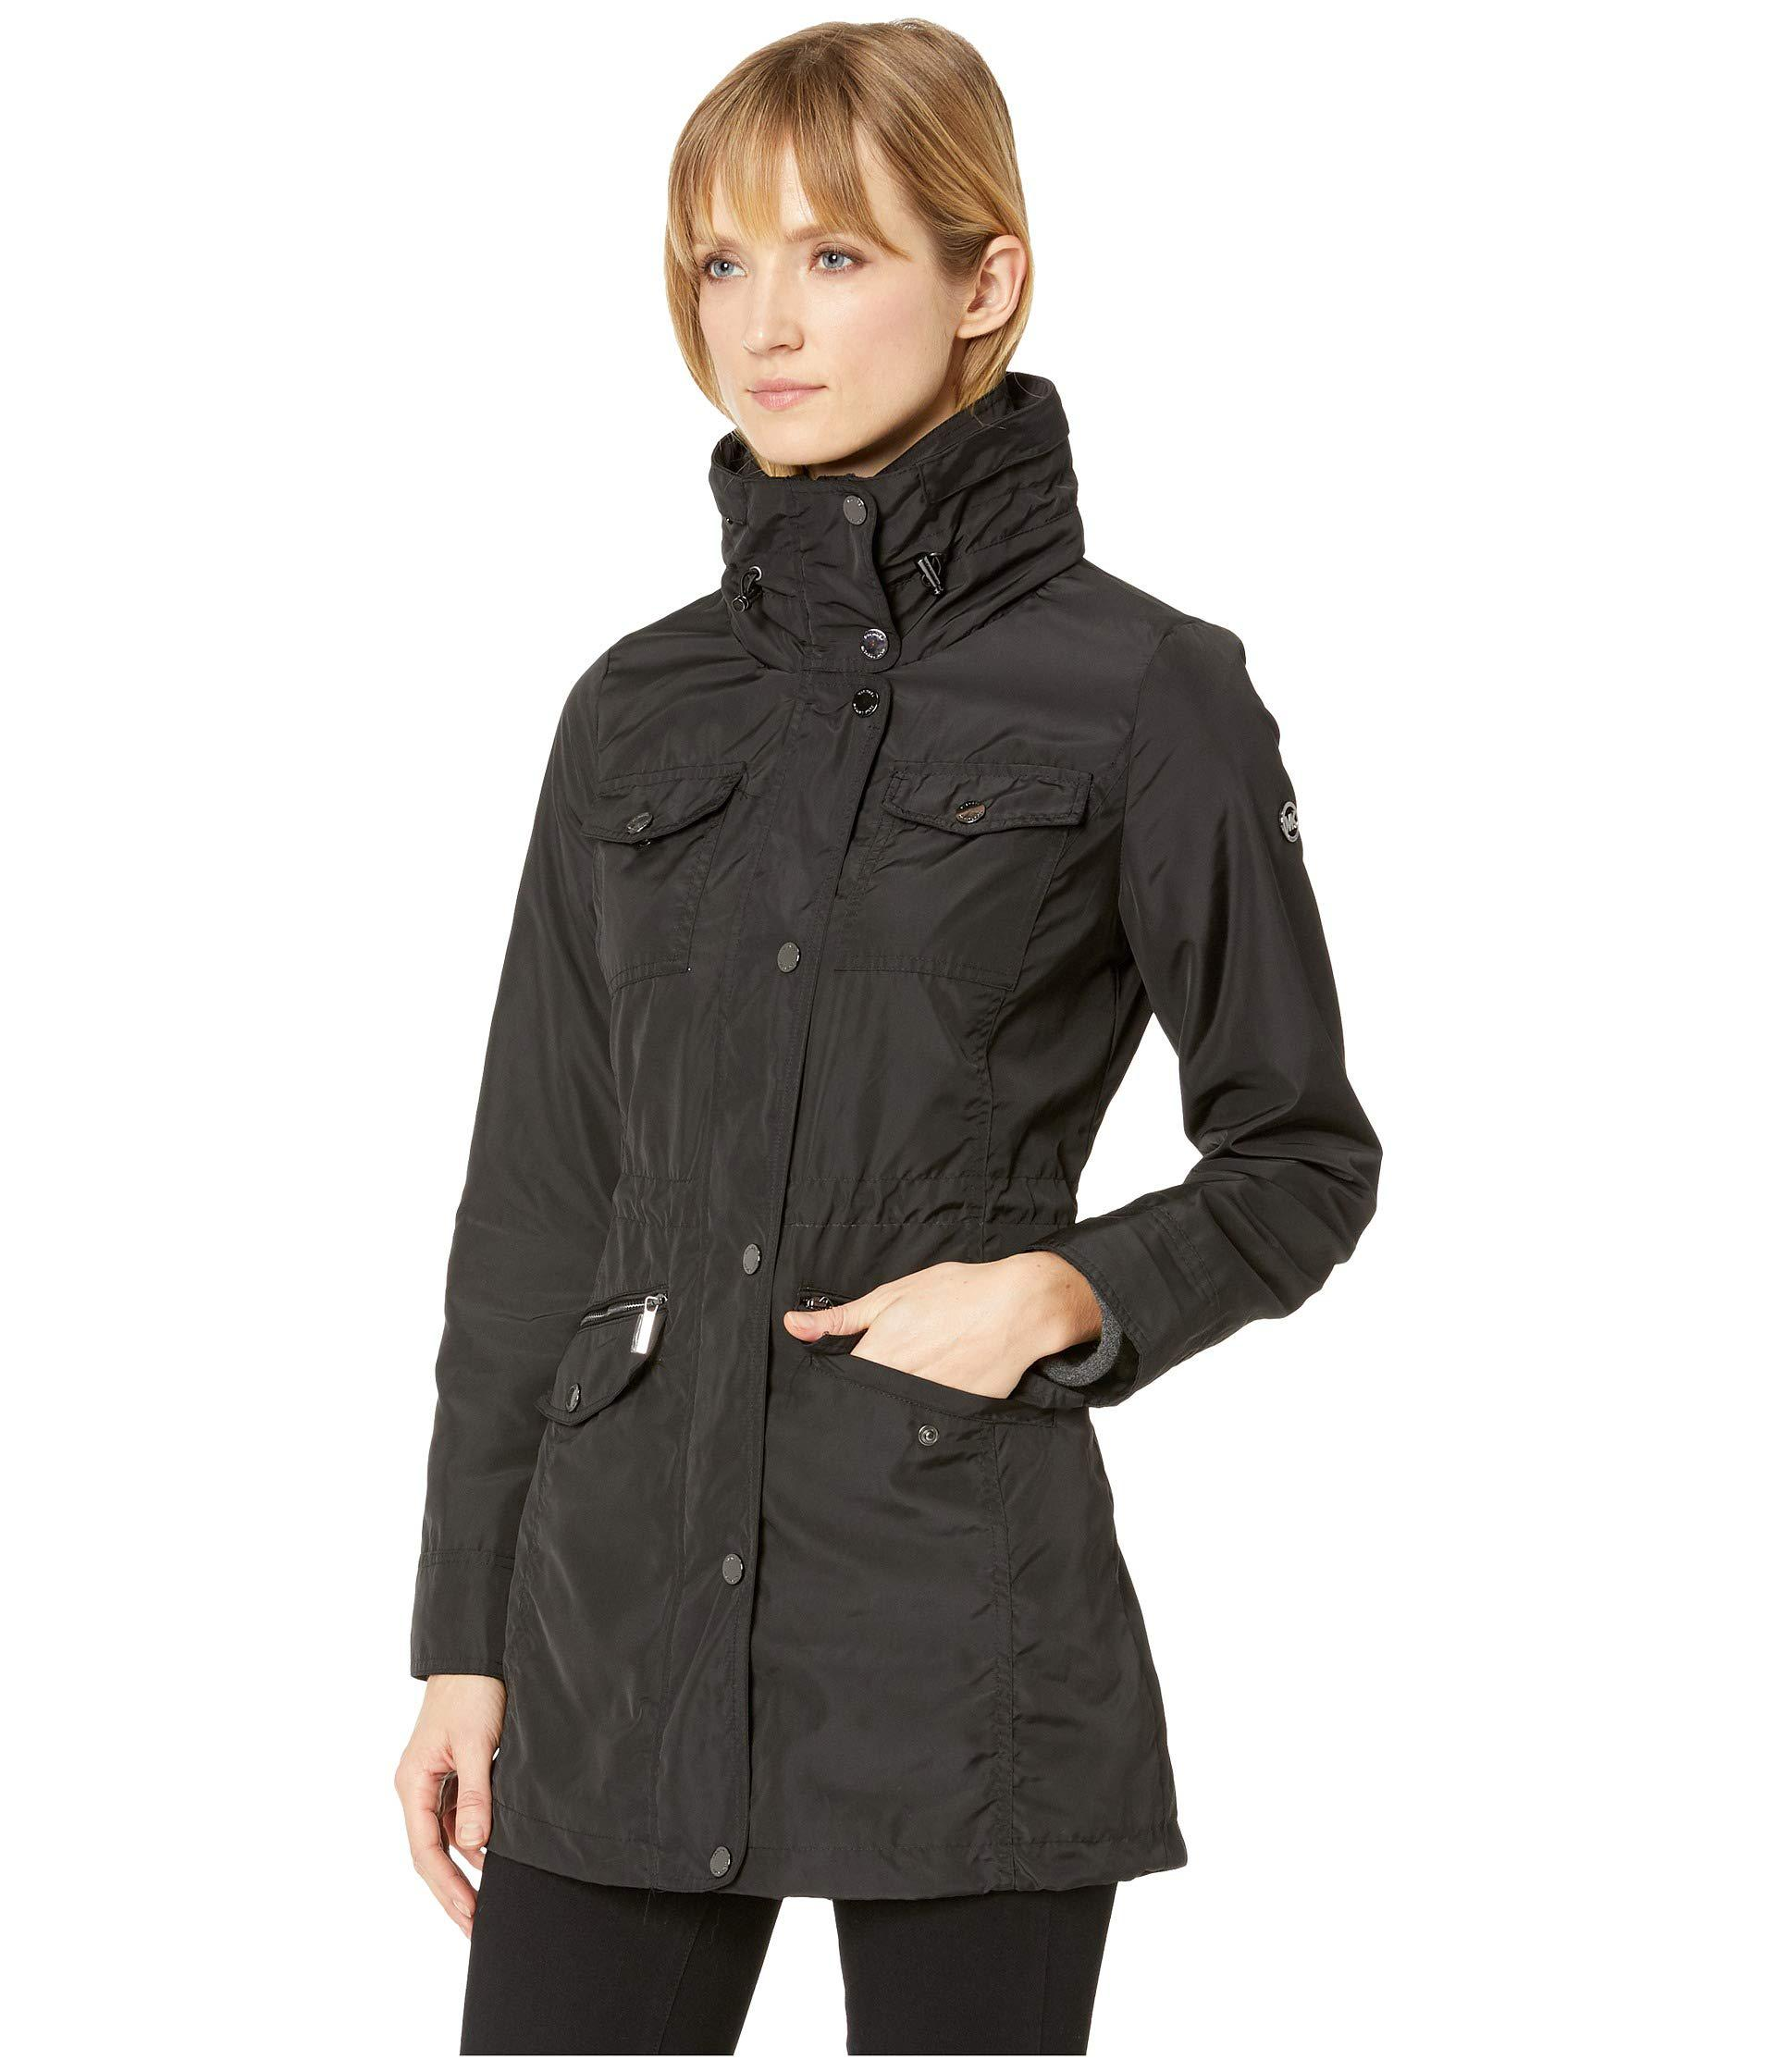 02775de43c9 Lyst - MICHAEL Michael Kors Snap Front Multi Pocket Rain Jacket M322930gz ( black) Women s Coat in Black